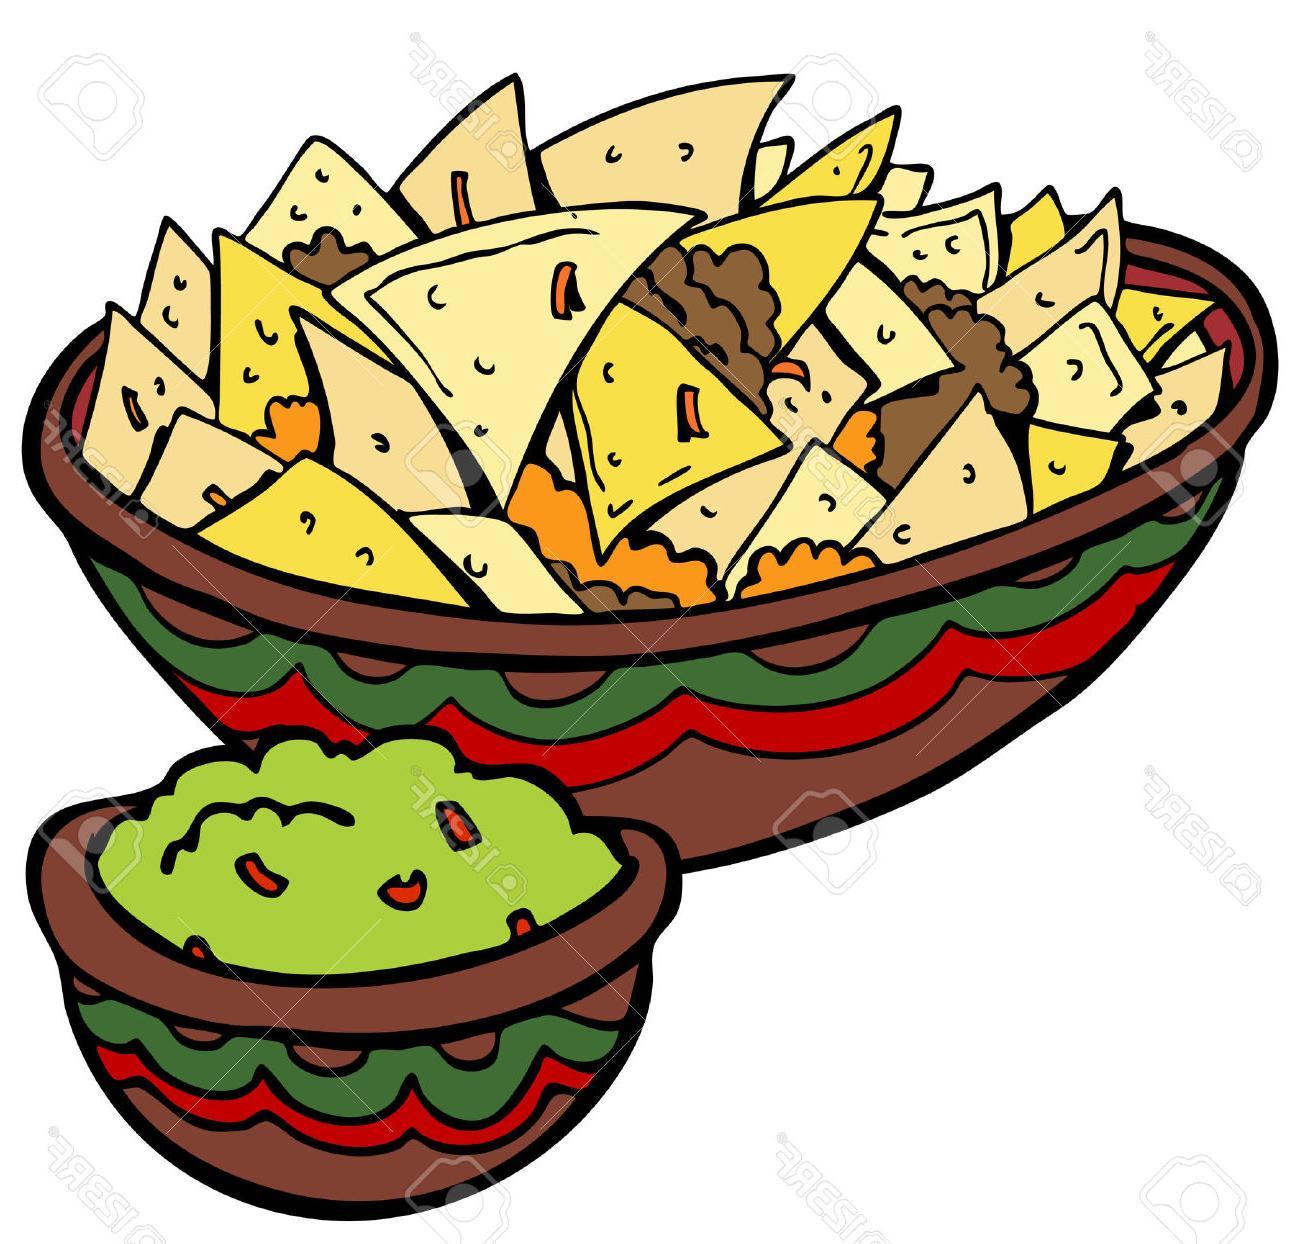 Tortilla free download best. Chip clipart vector